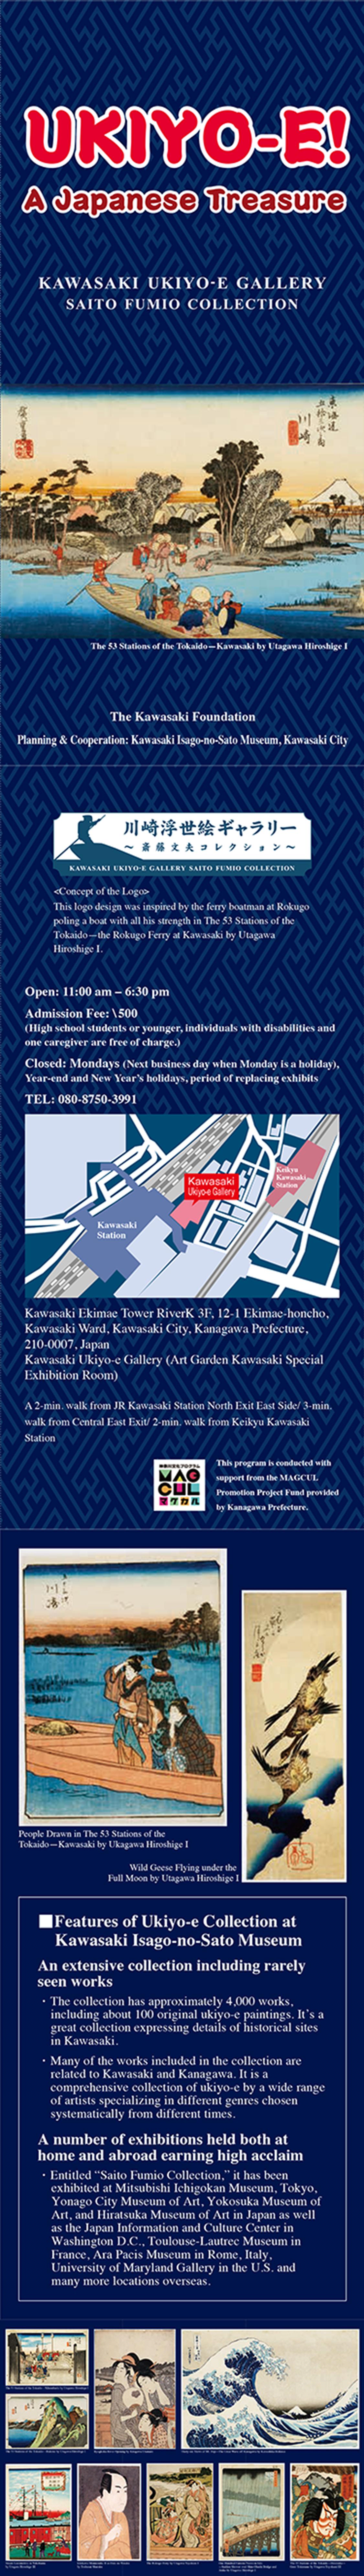 image:KAWASAKI UKIYO-E GALLERY SAITO FUMIO COLLECTION english pamphlet